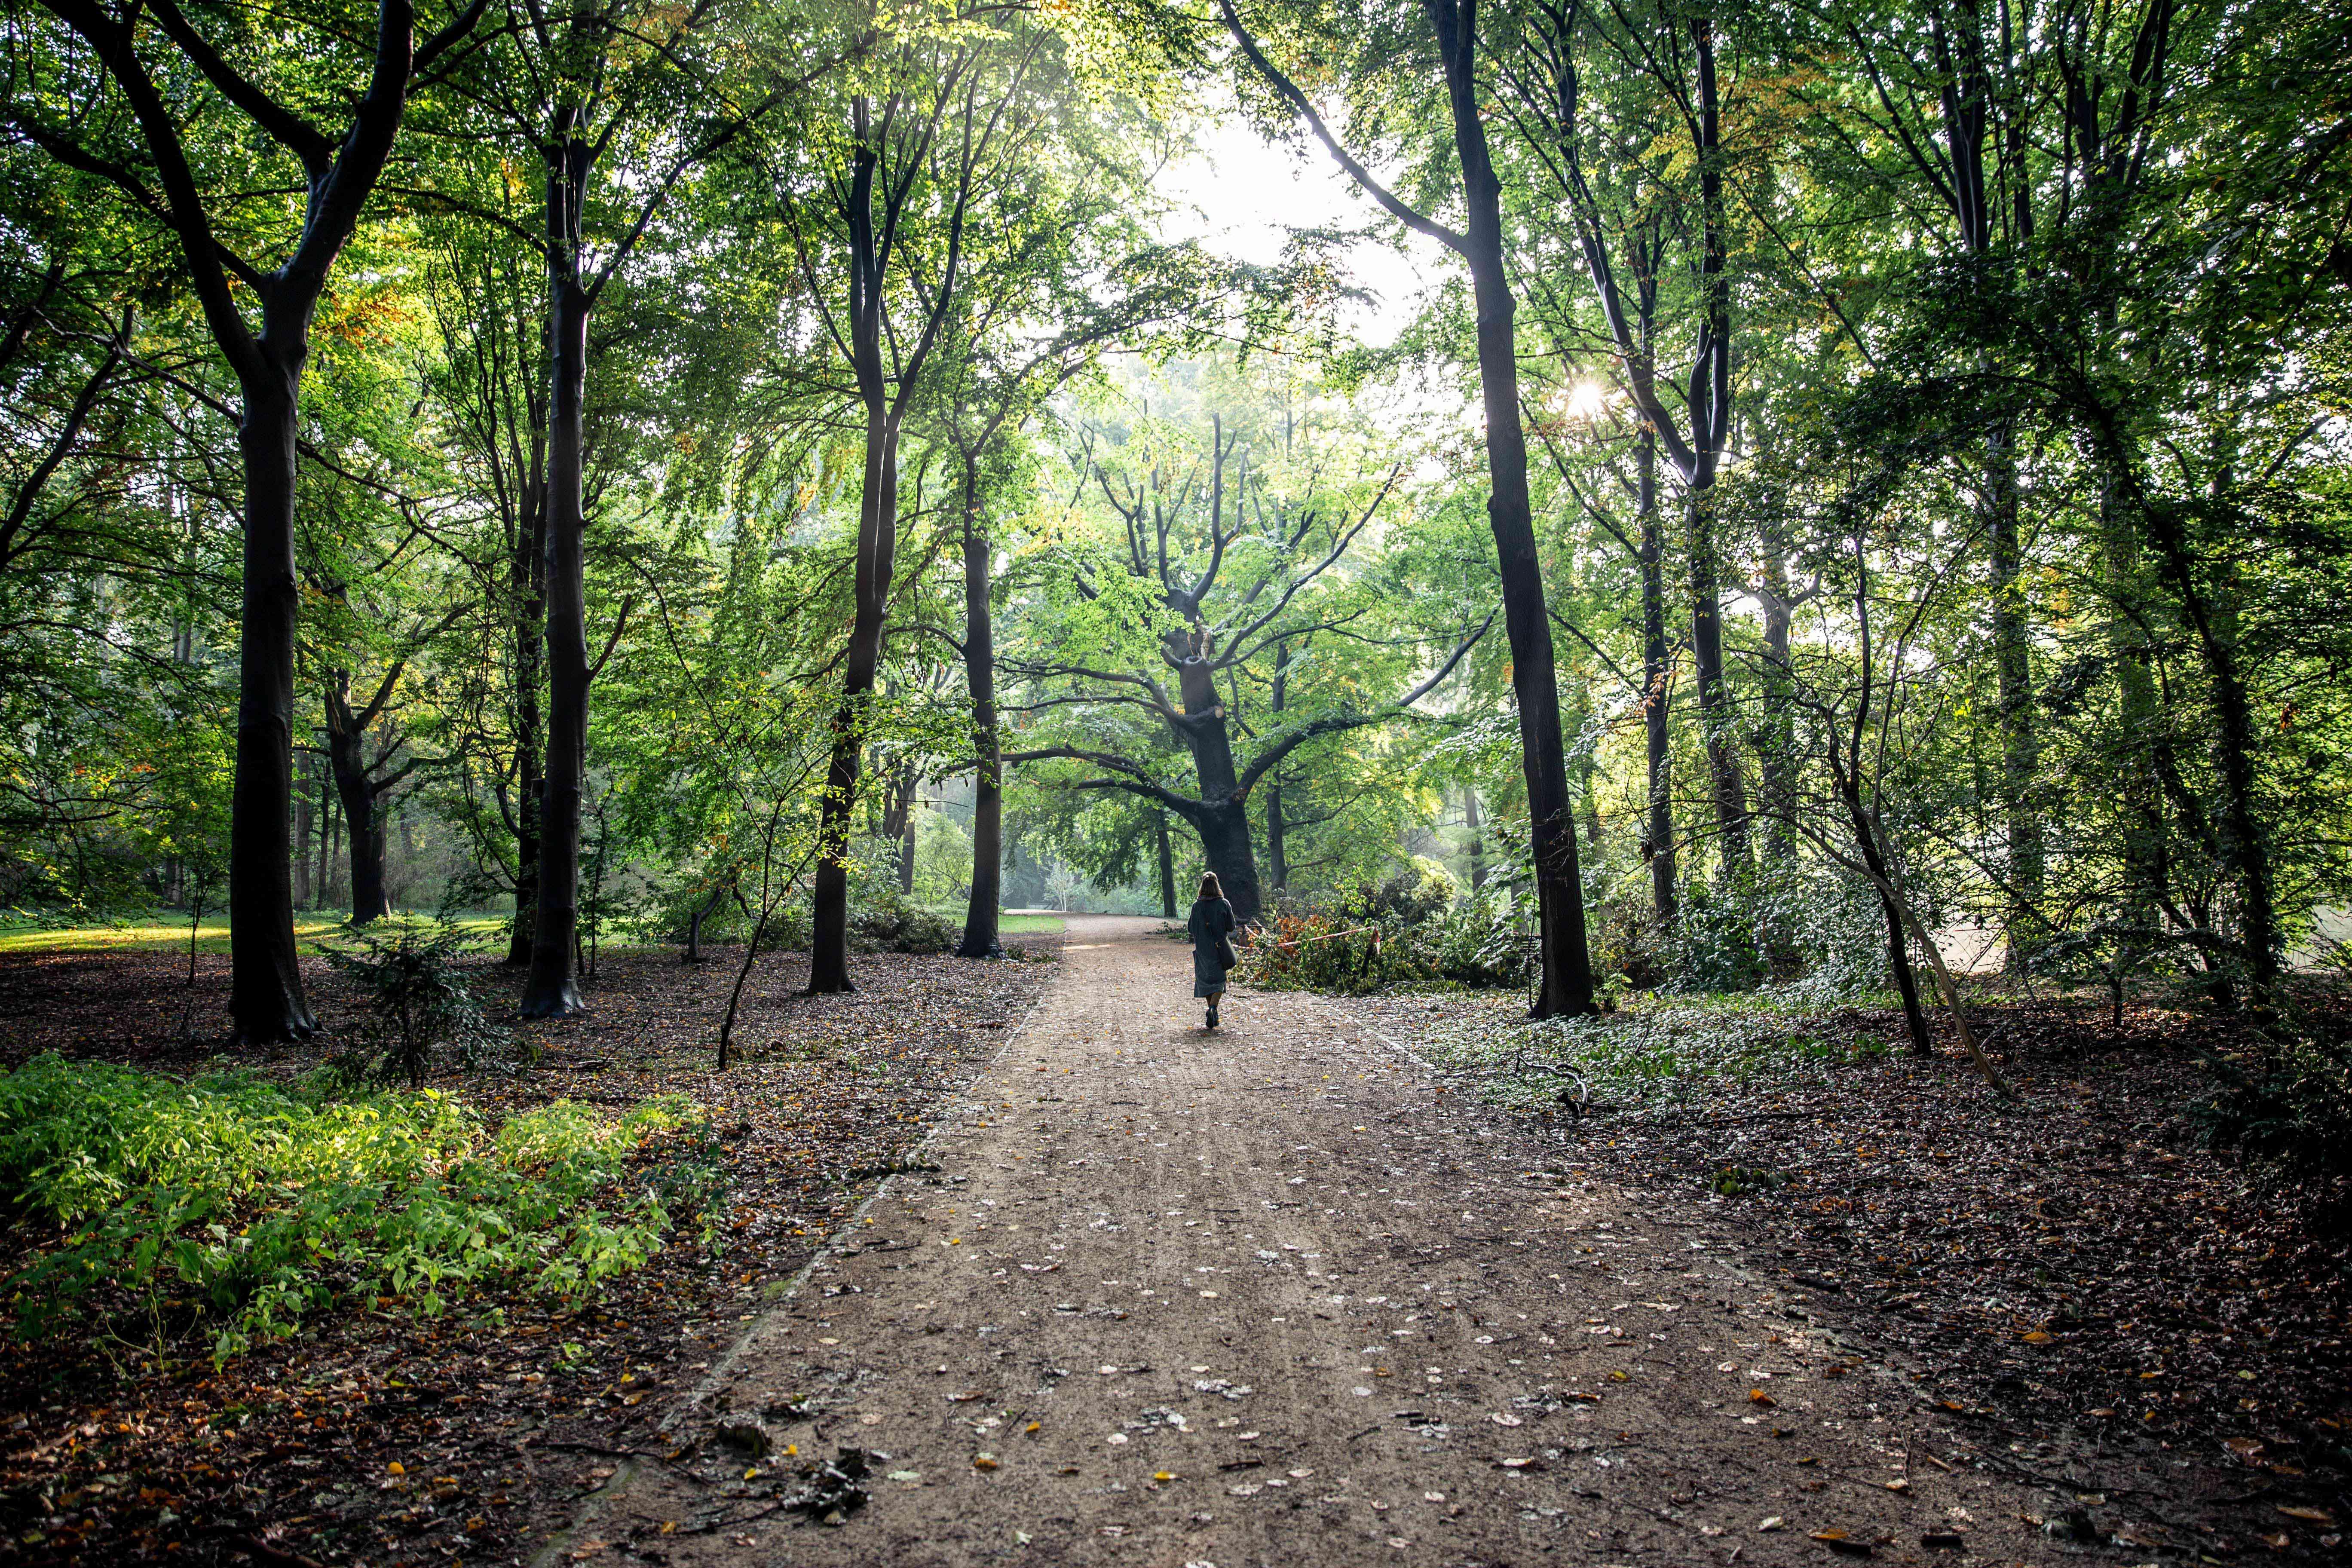 A woman walking through Tiergarten